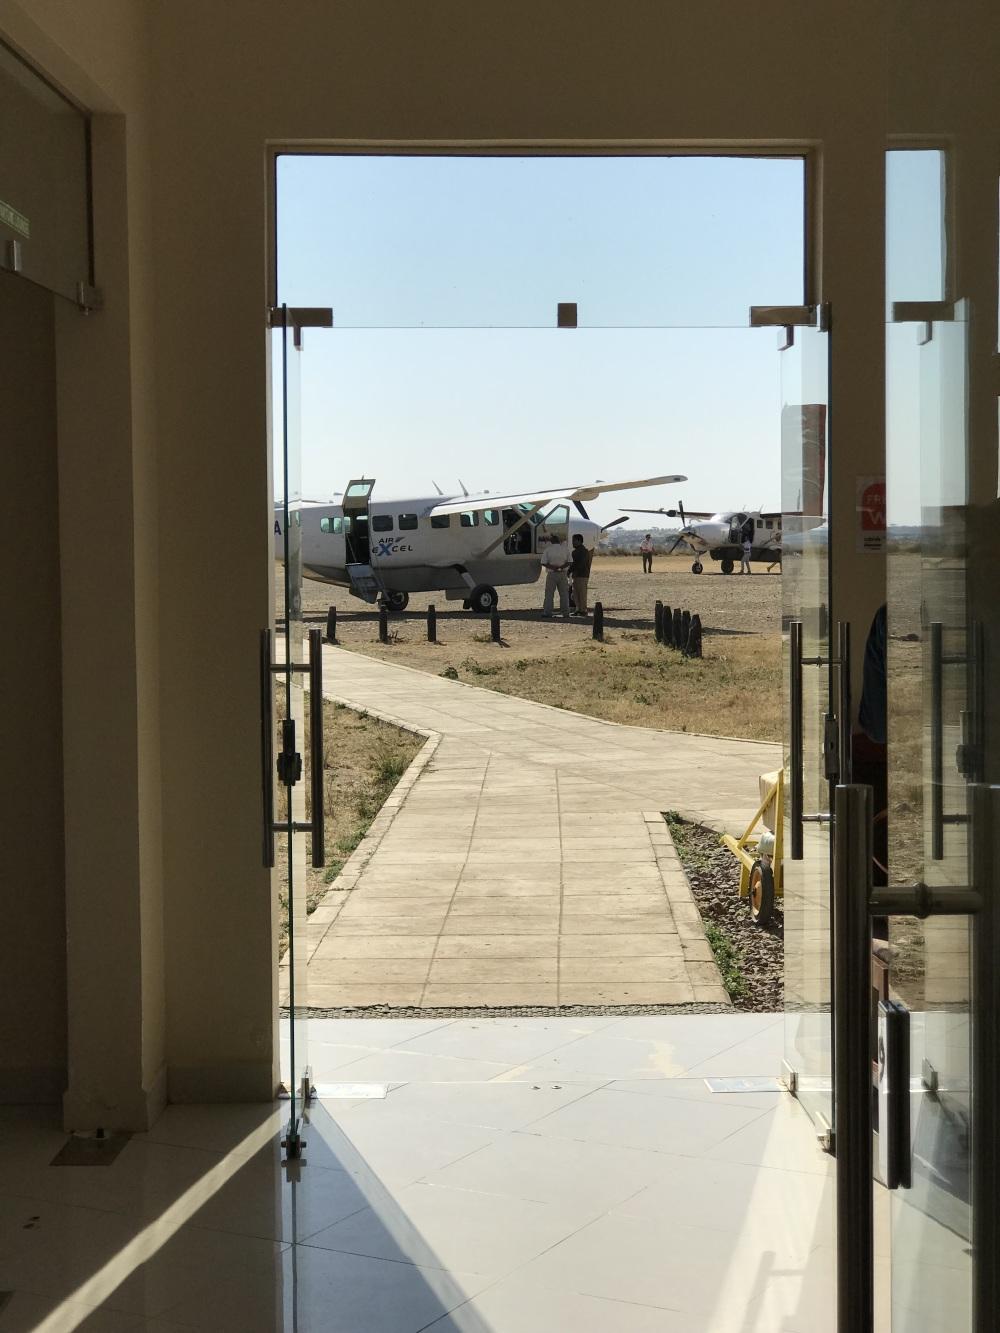 #44 - Seronera airstrip- Serengeti